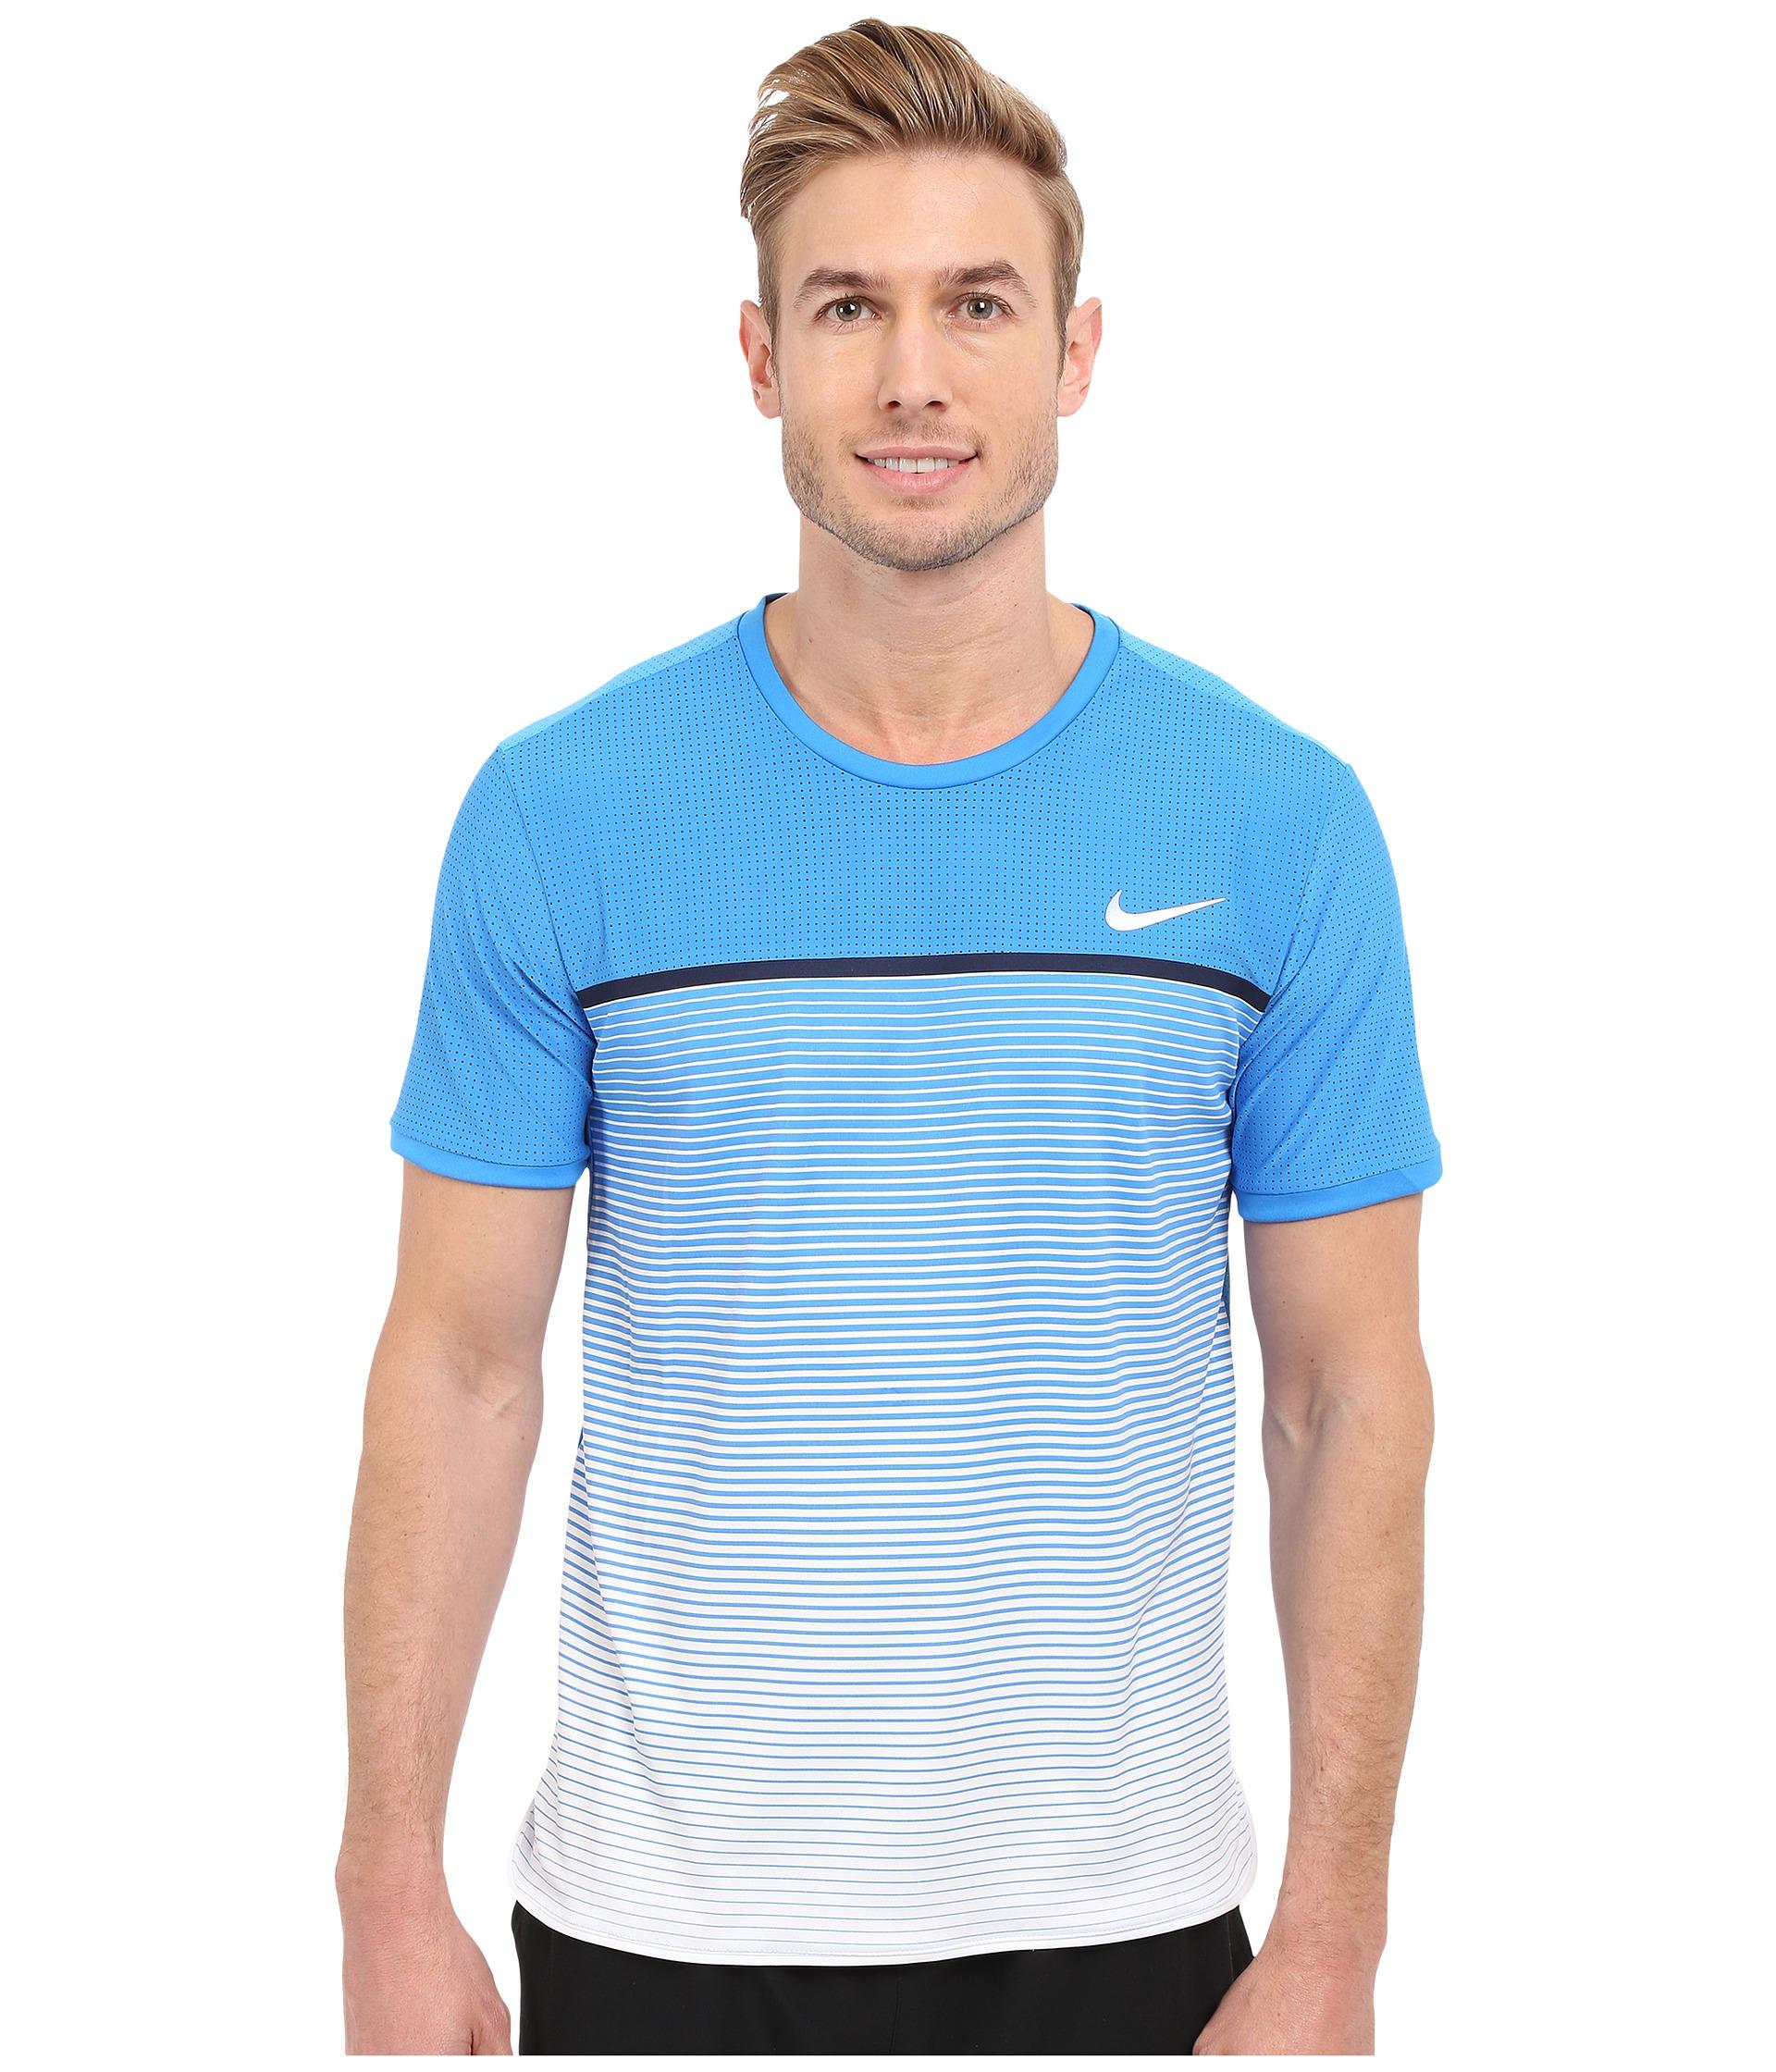 3a975c67 Nike Challenger Premier Crew in Blue for Men - Lyst